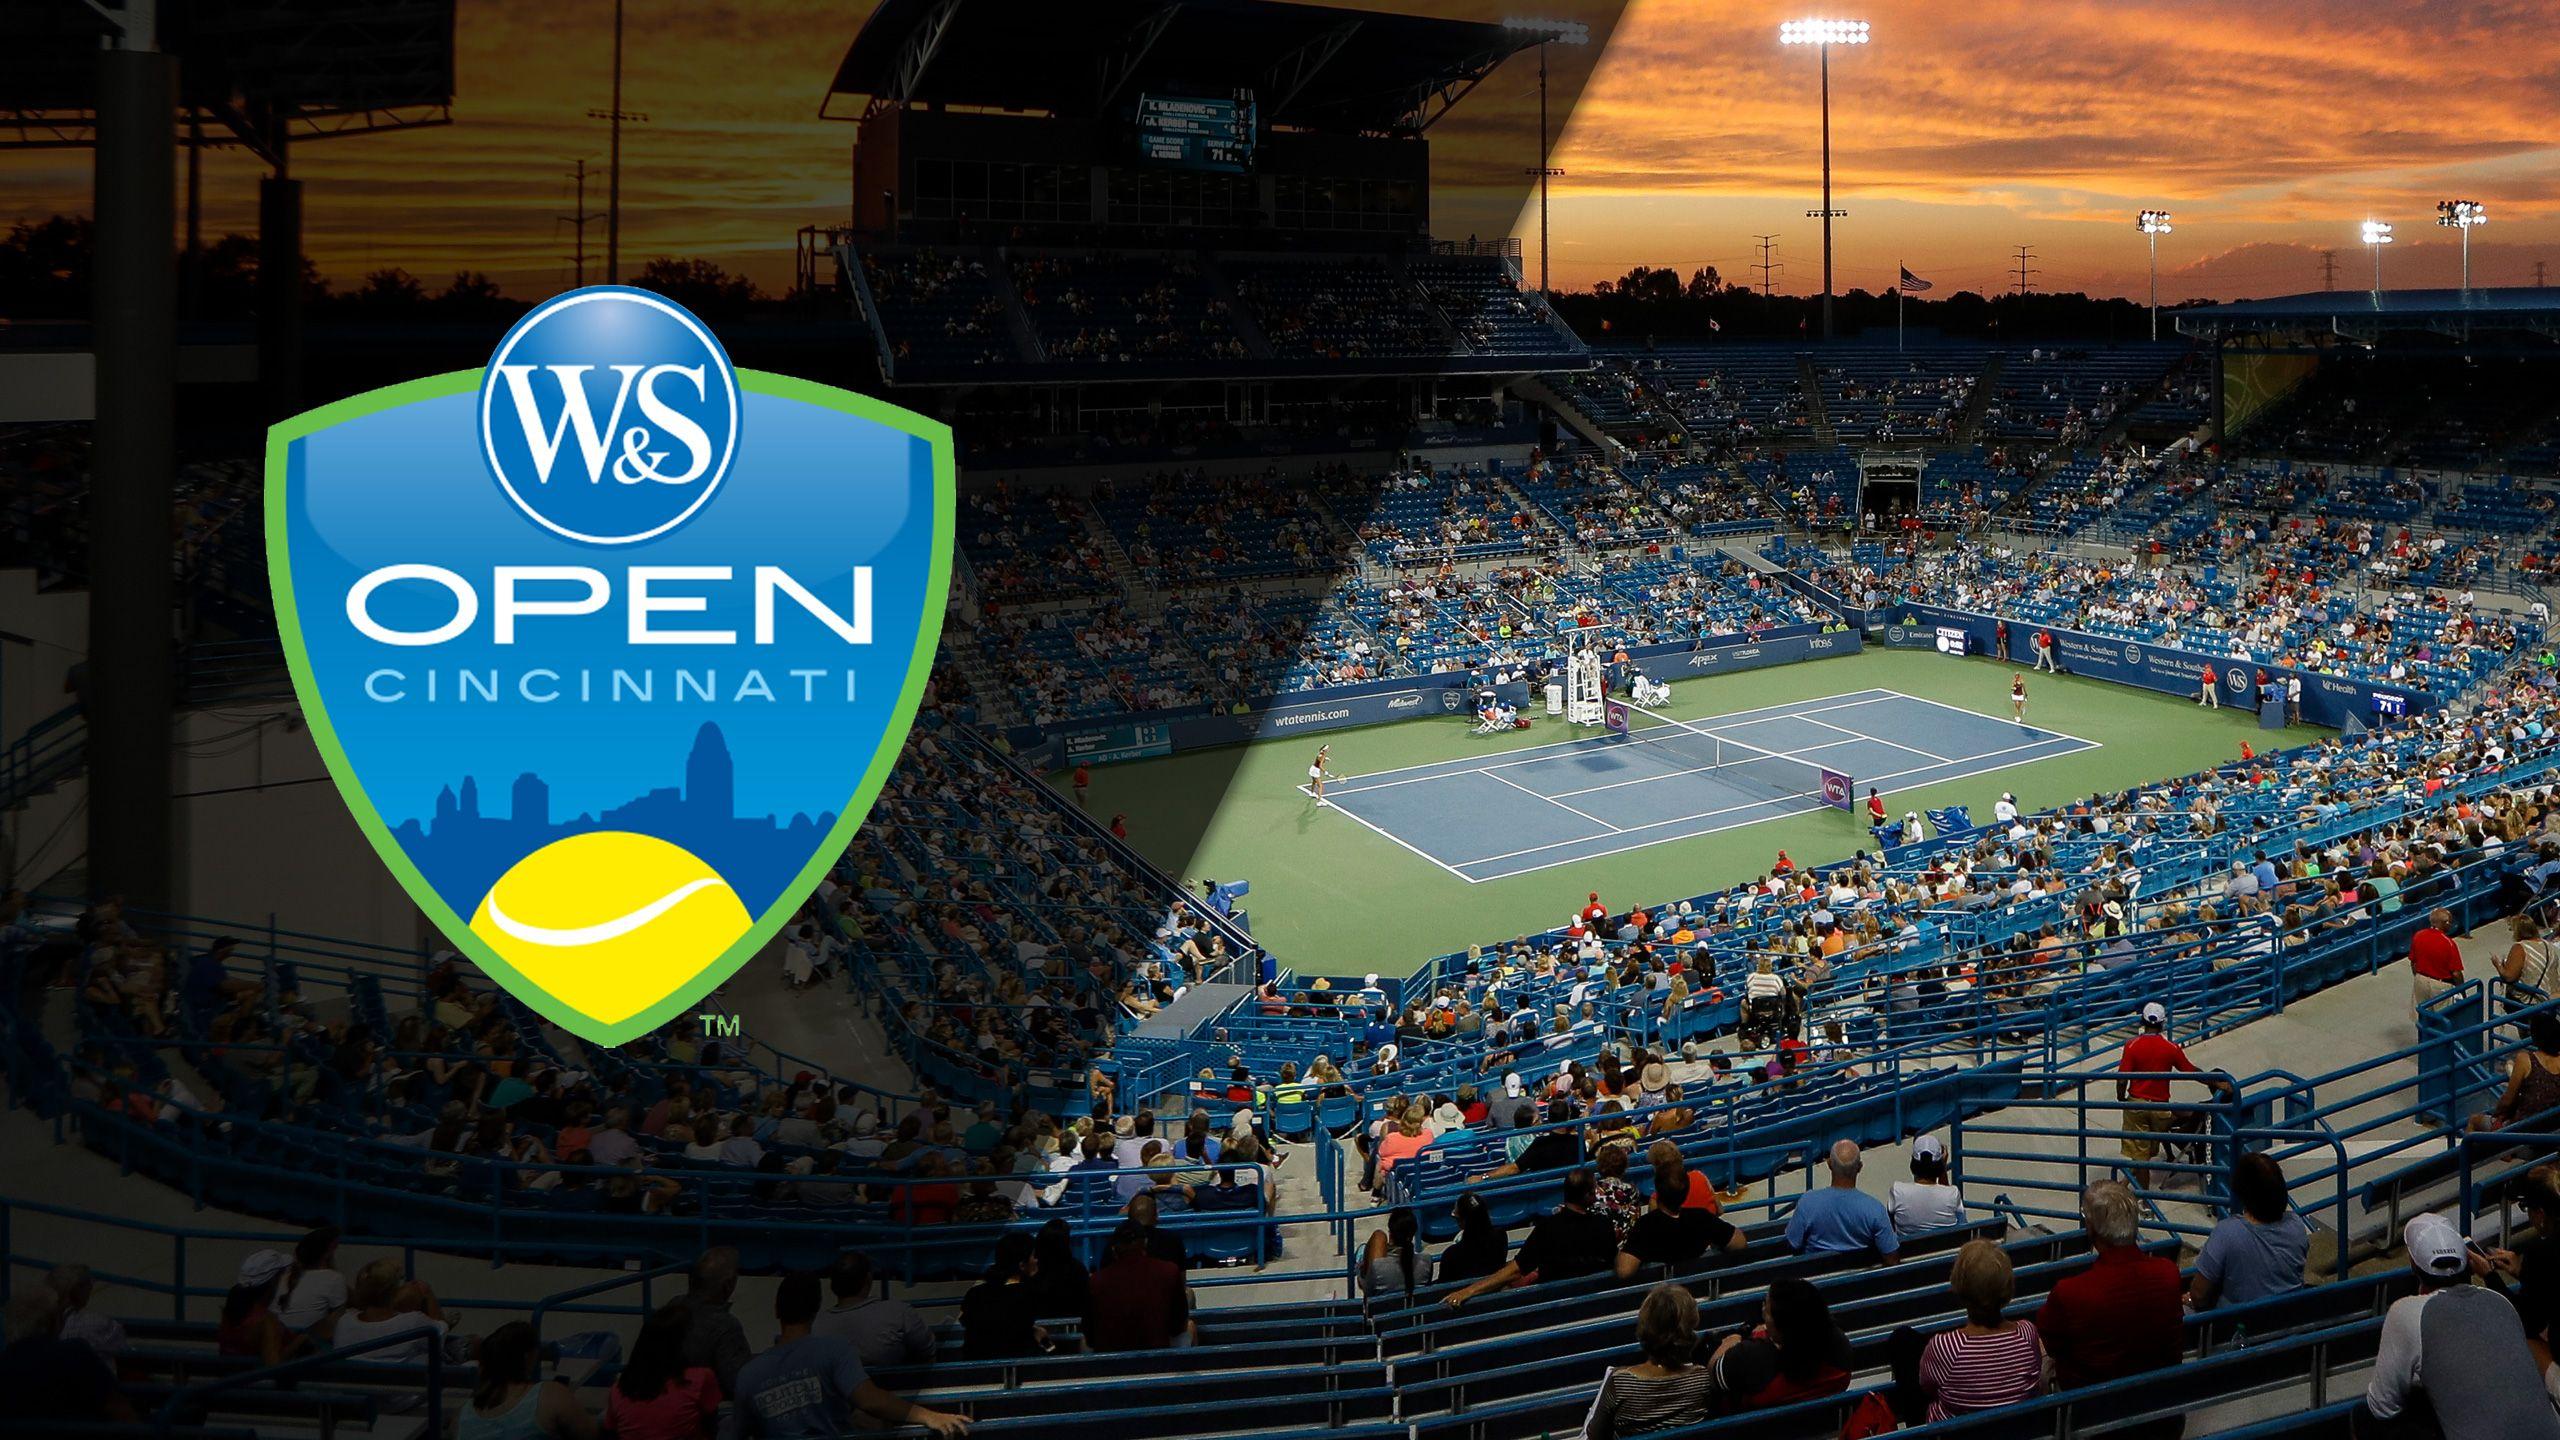 2017 US Open Series - Western & Southern Open